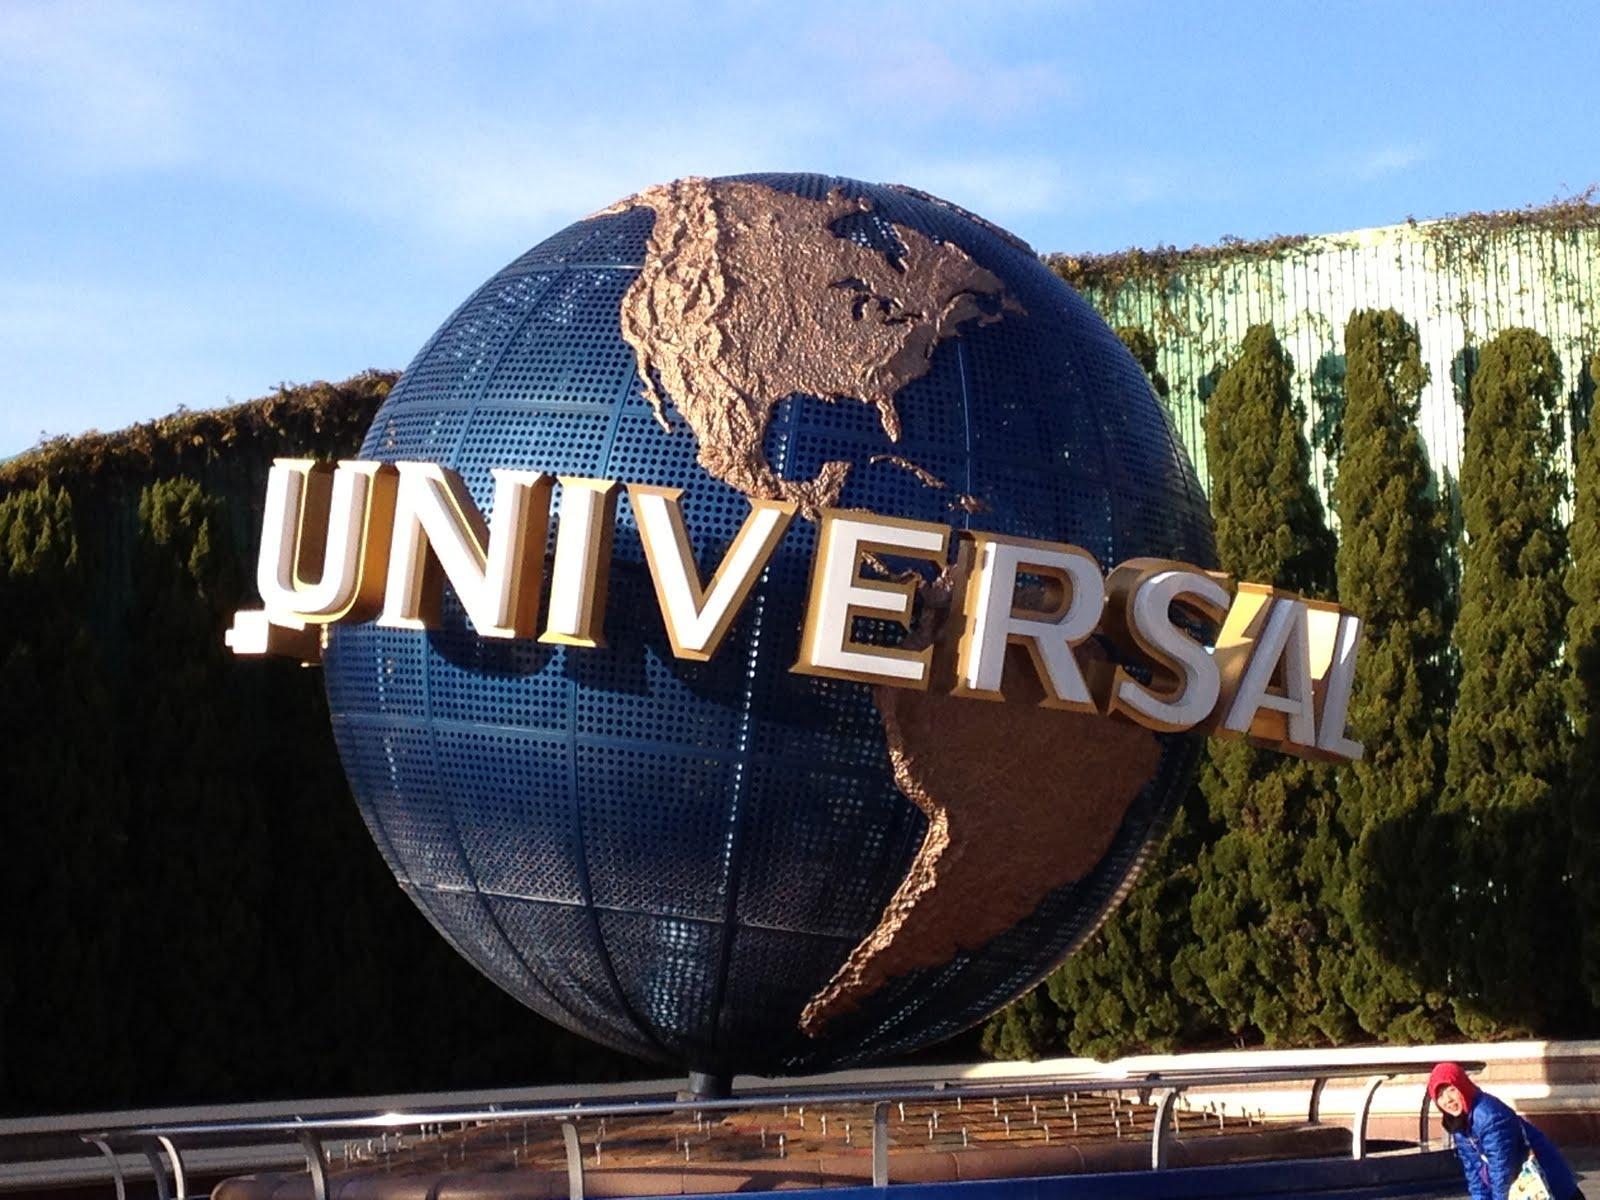 Universal Studios Osaka Japan Full Desktop Backgrounds 1600x1200